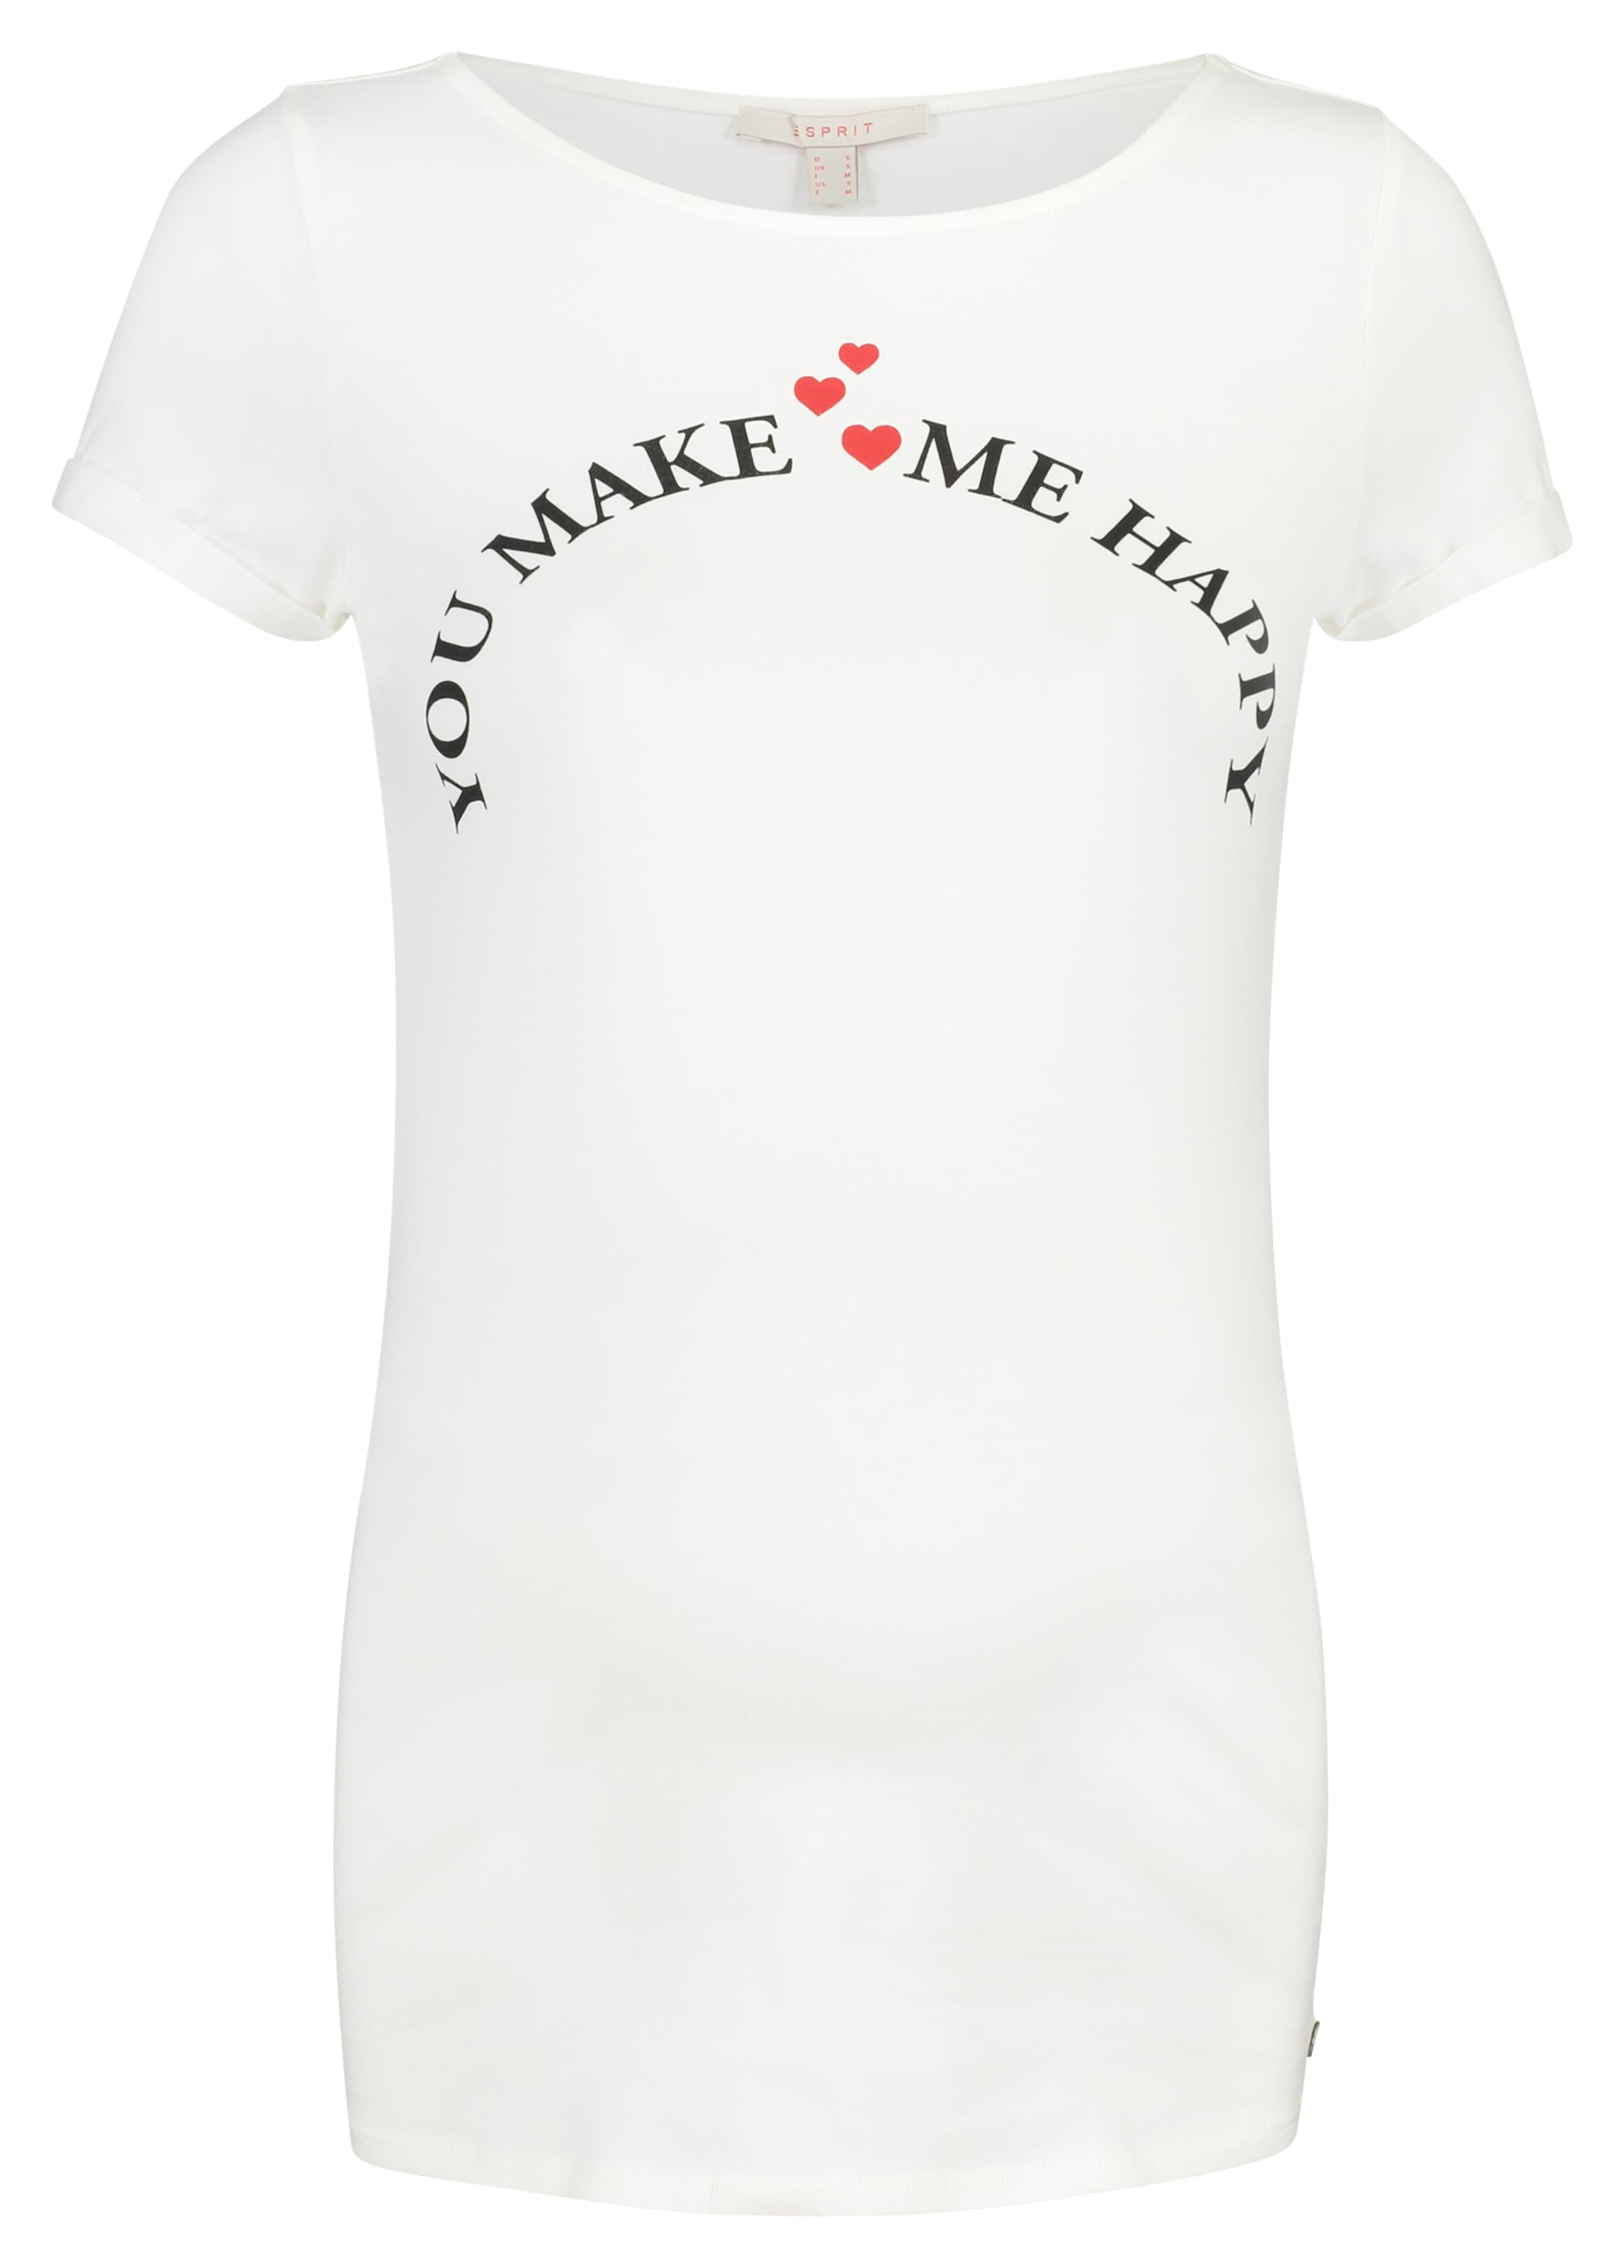 shirt Maternity T In HellrotSchwarz Esprit Offwhite 5j3L4AR